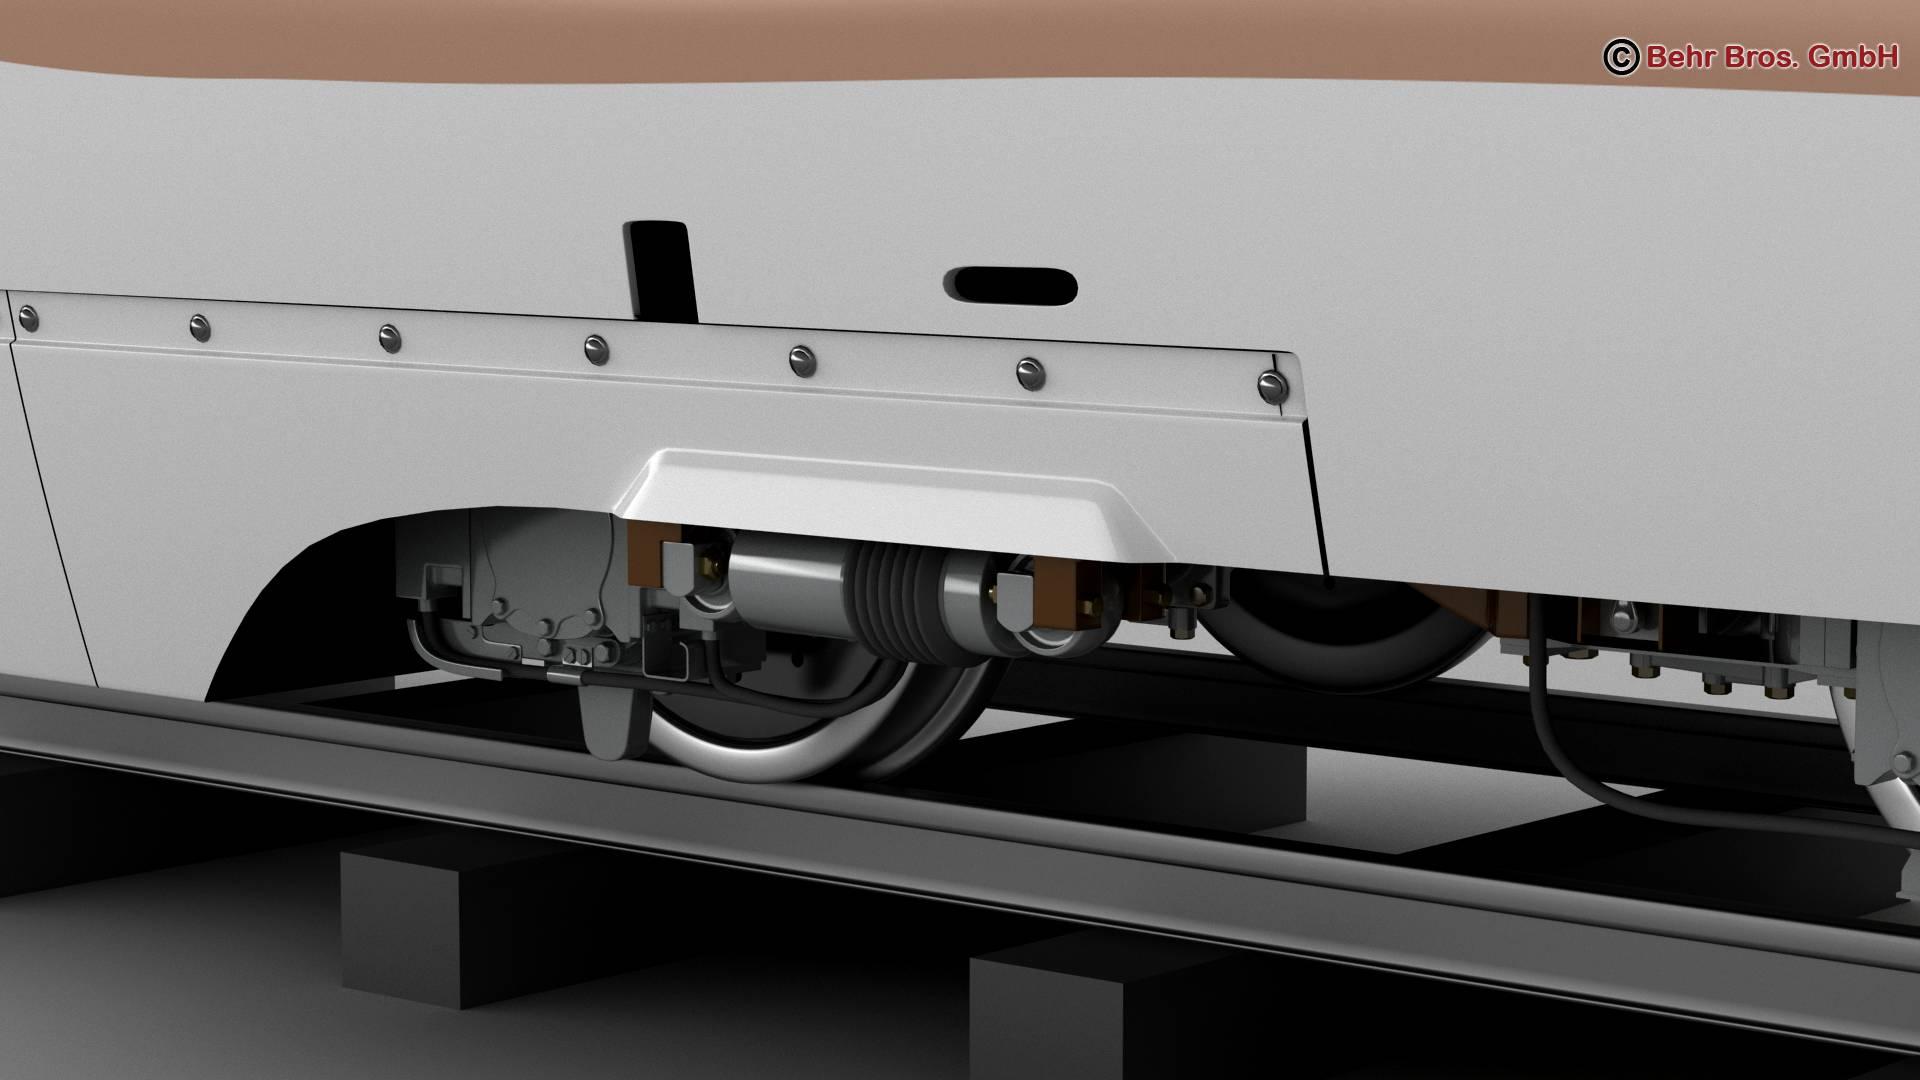 shinkansen e7 3d model 3ds max fbx c4d lwo ma mb obj 265647